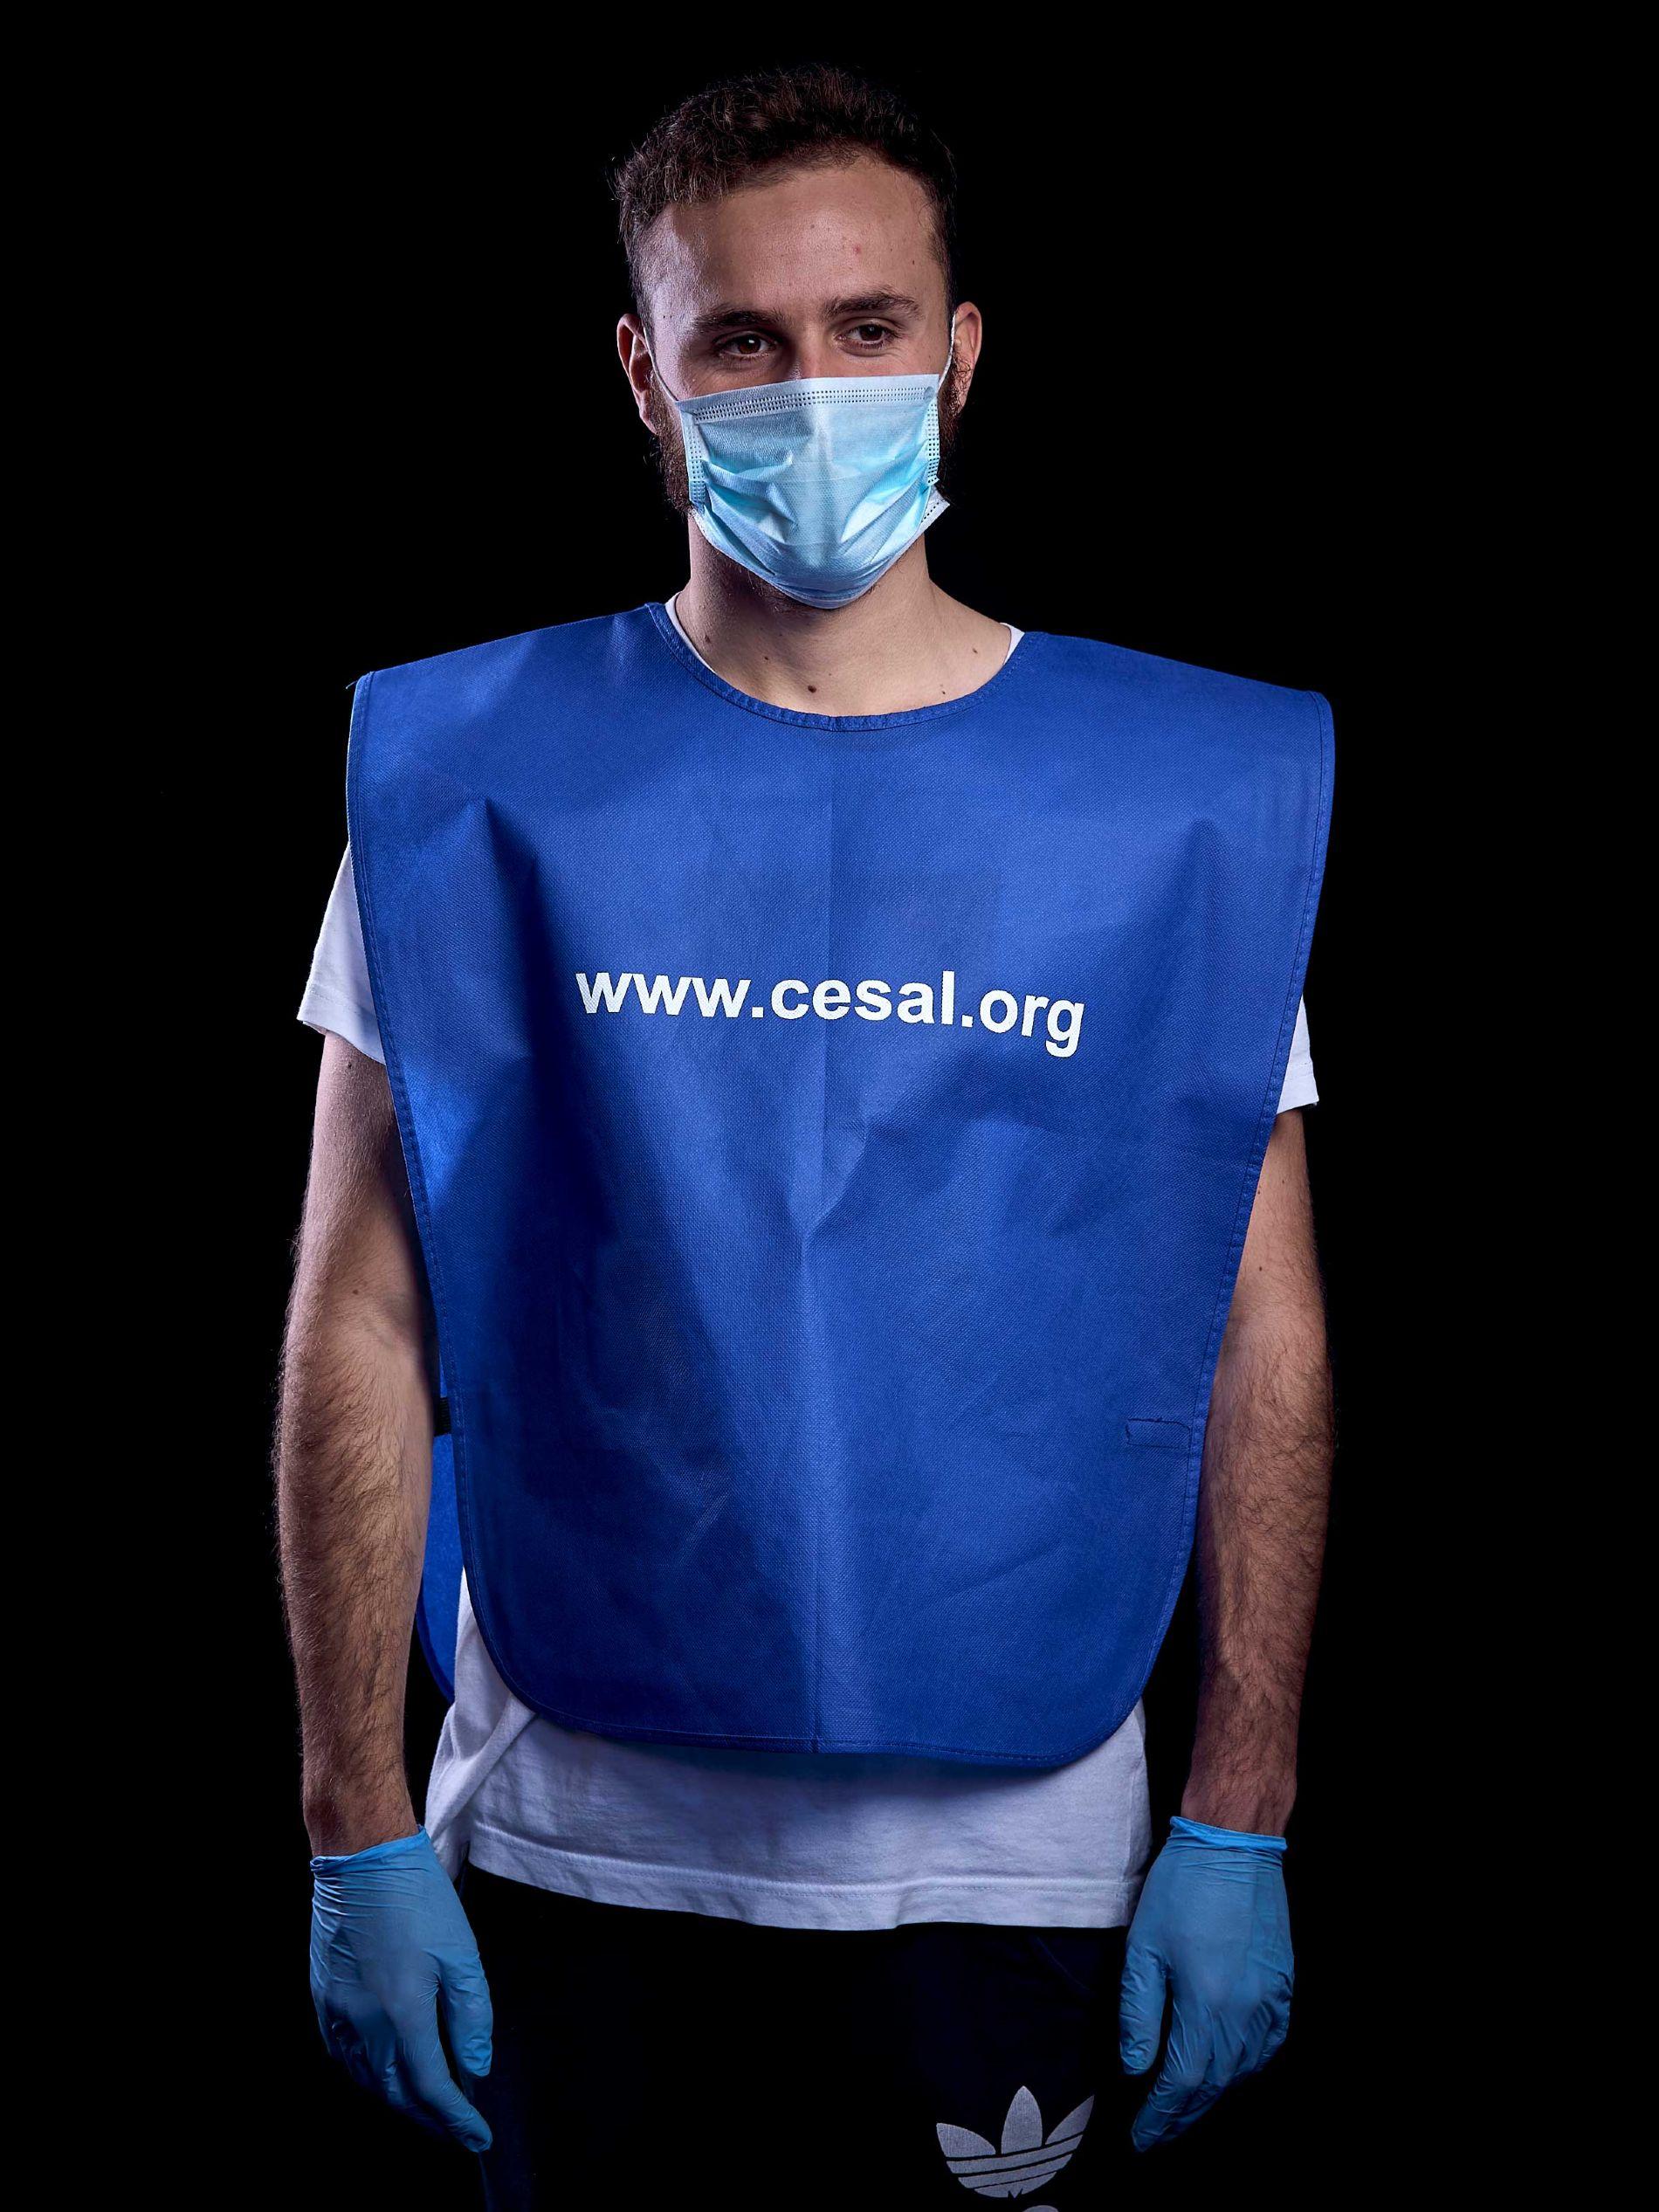 coronavirus; emergencia; salud; CESAL; dona; voluntariado